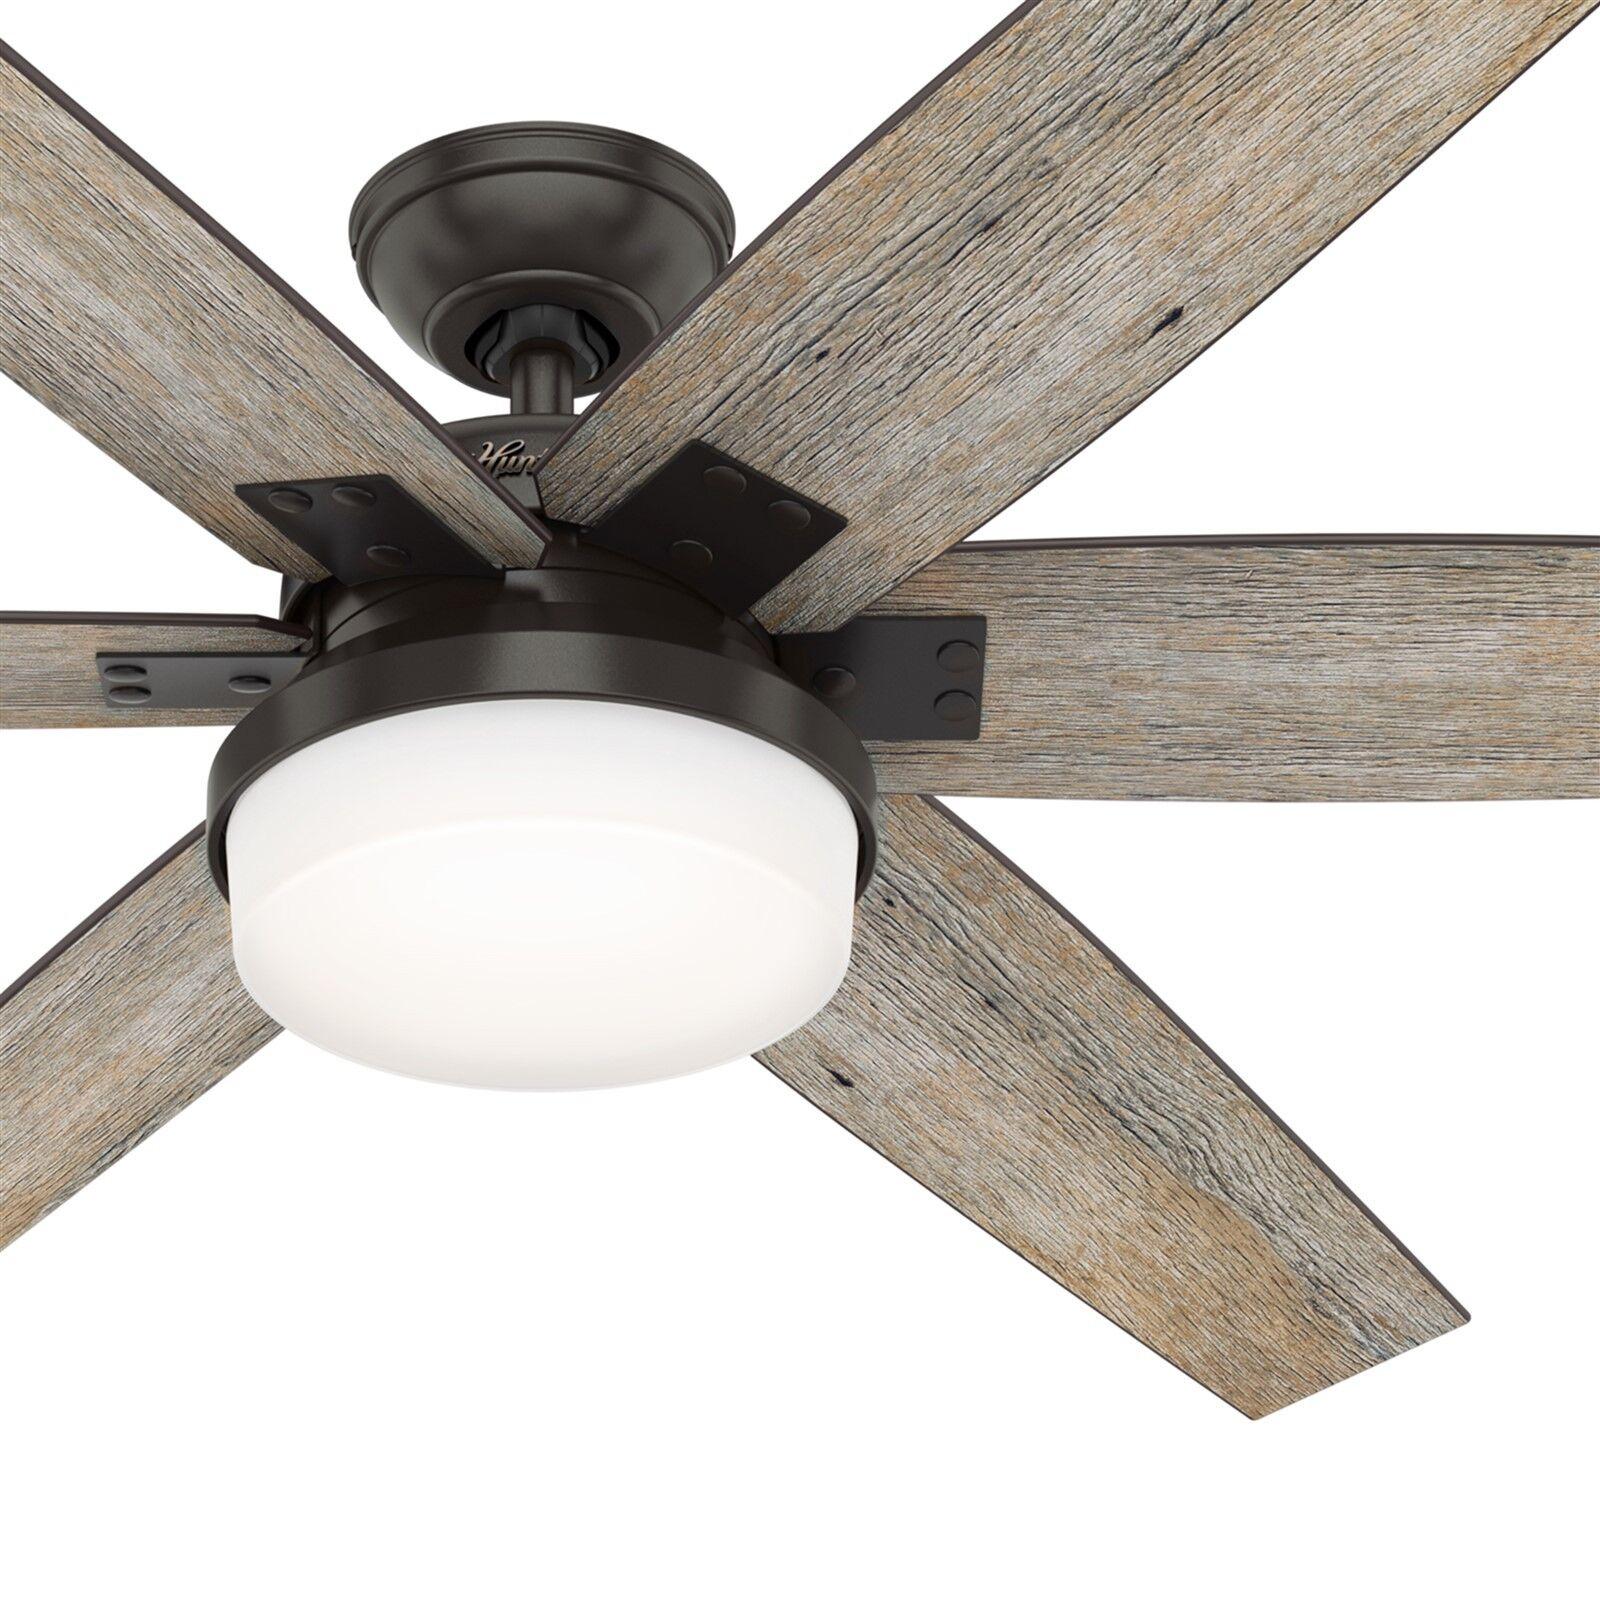 Hunter Fan 64 Inch Nobel Bronze Ceiling Fan With Light Kit And Remote Control Ebay